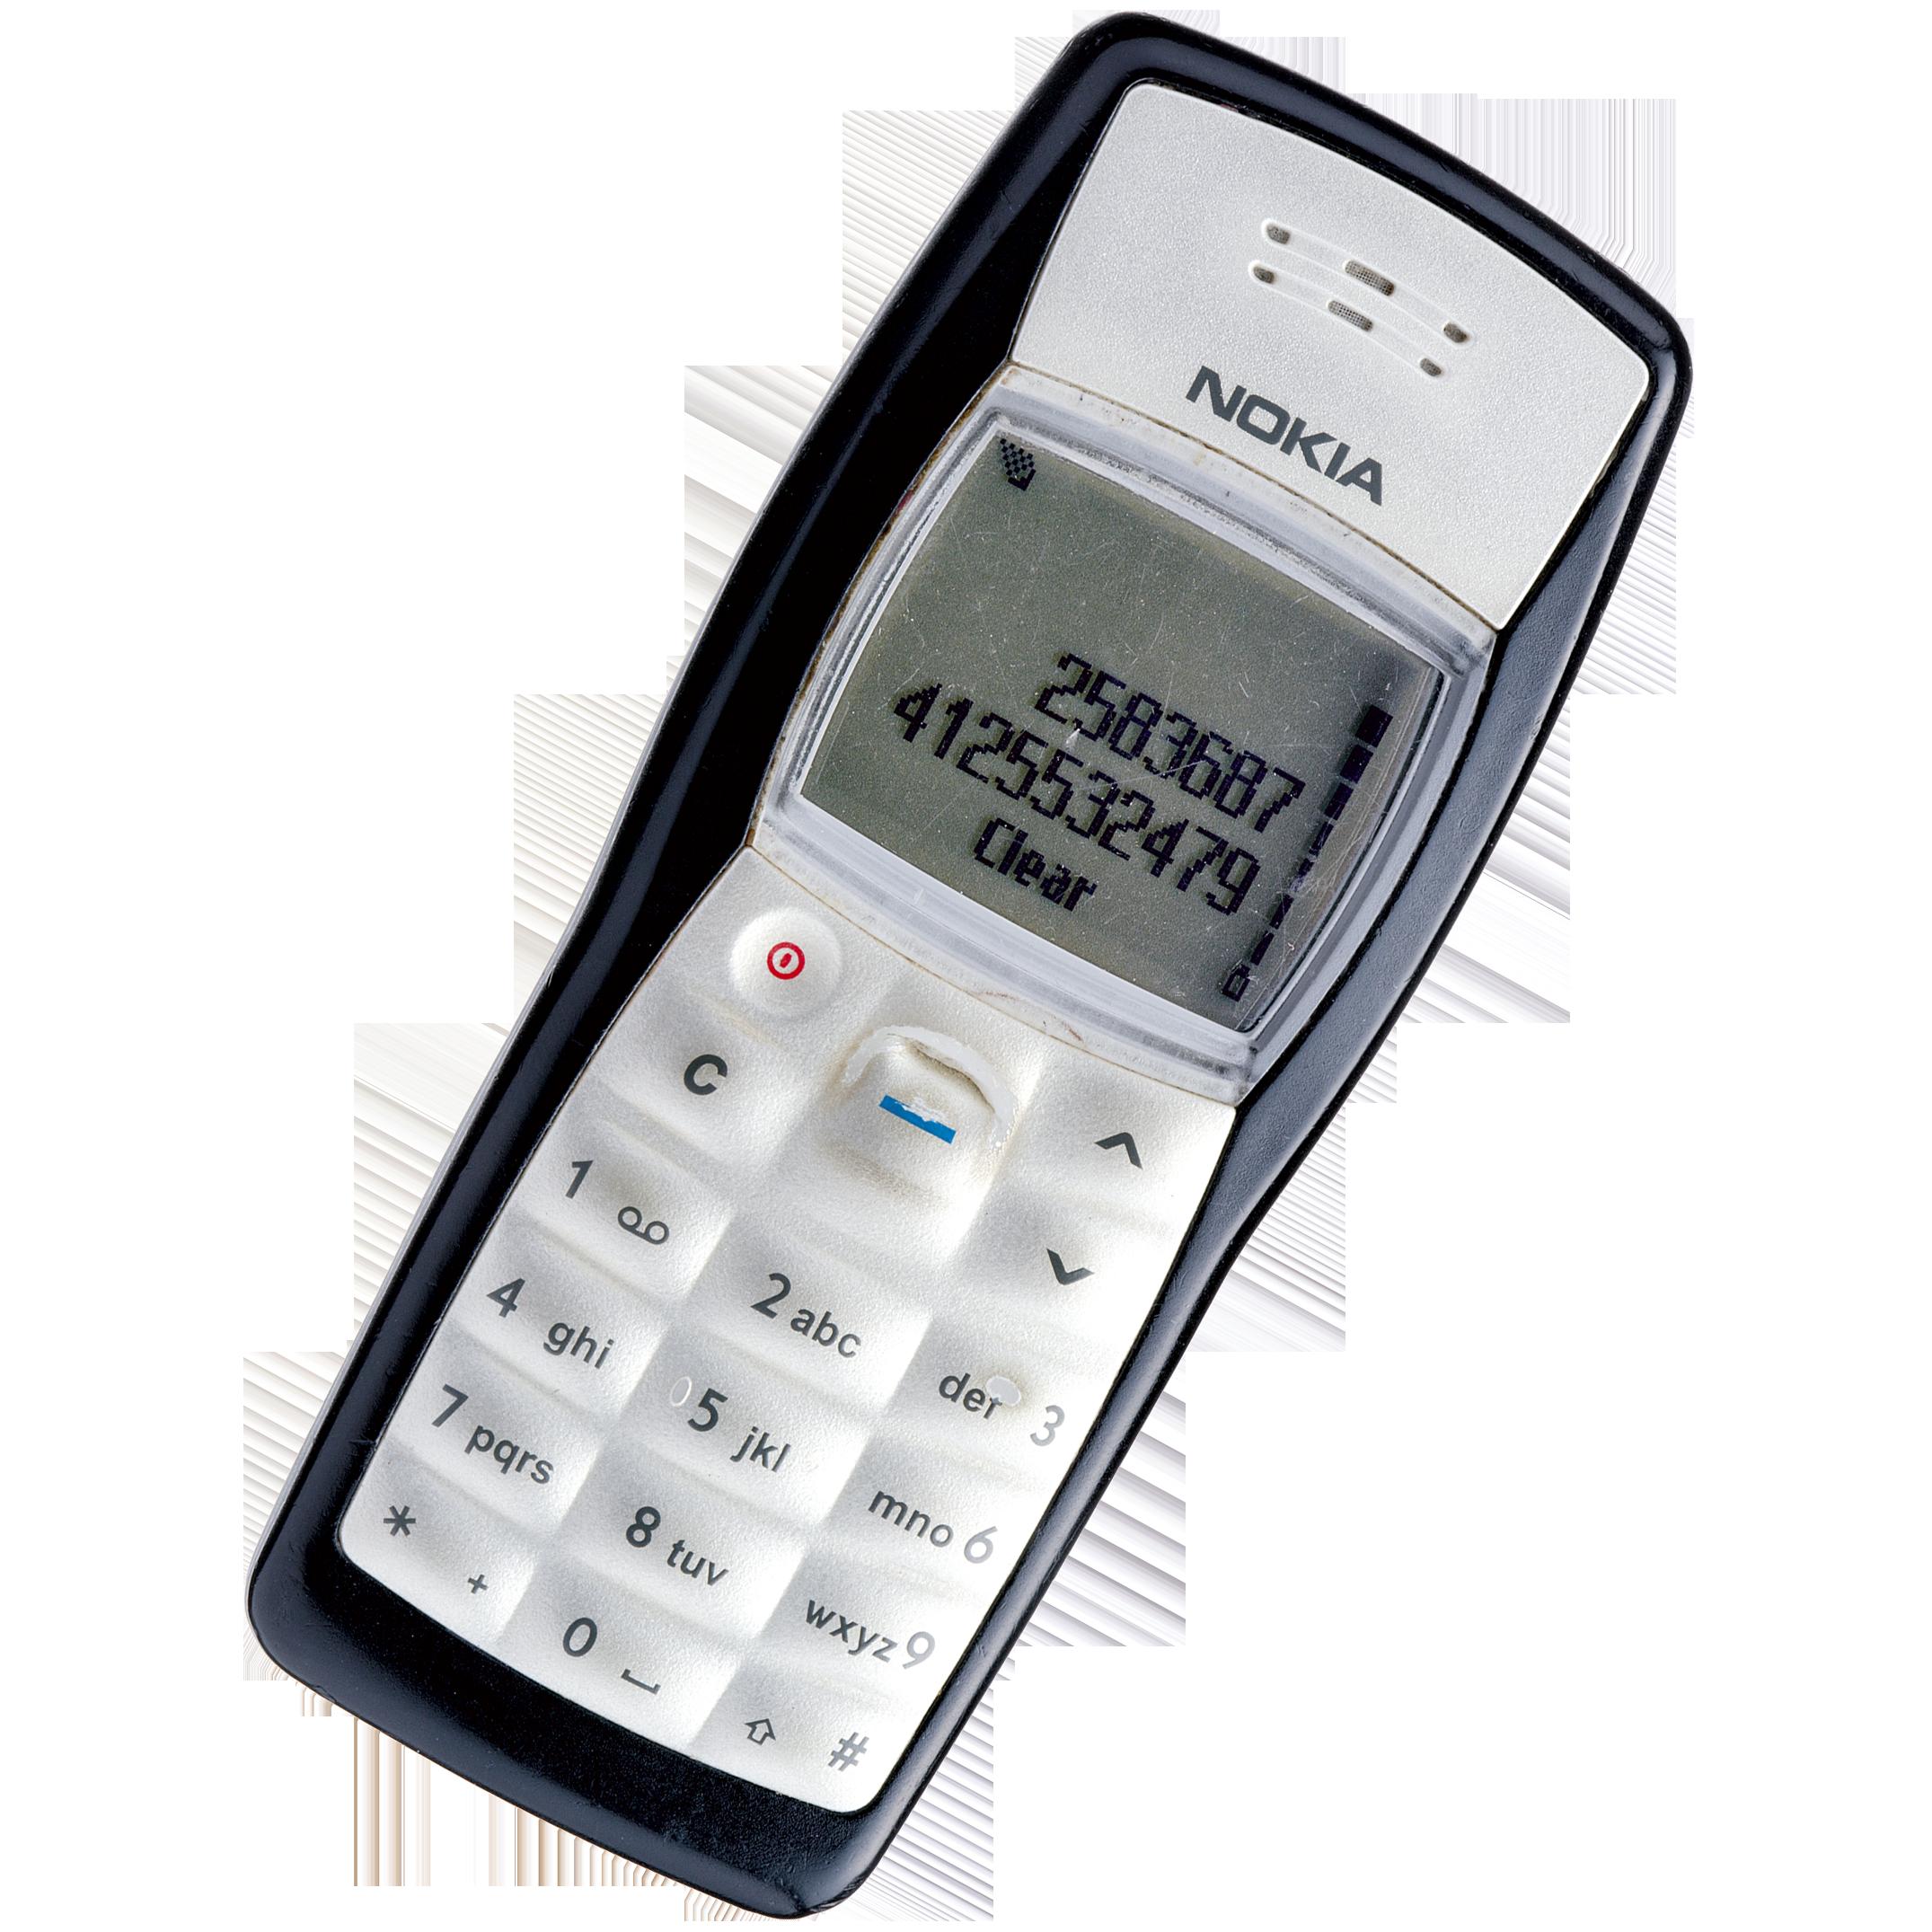 Nokia 1100 Bochum